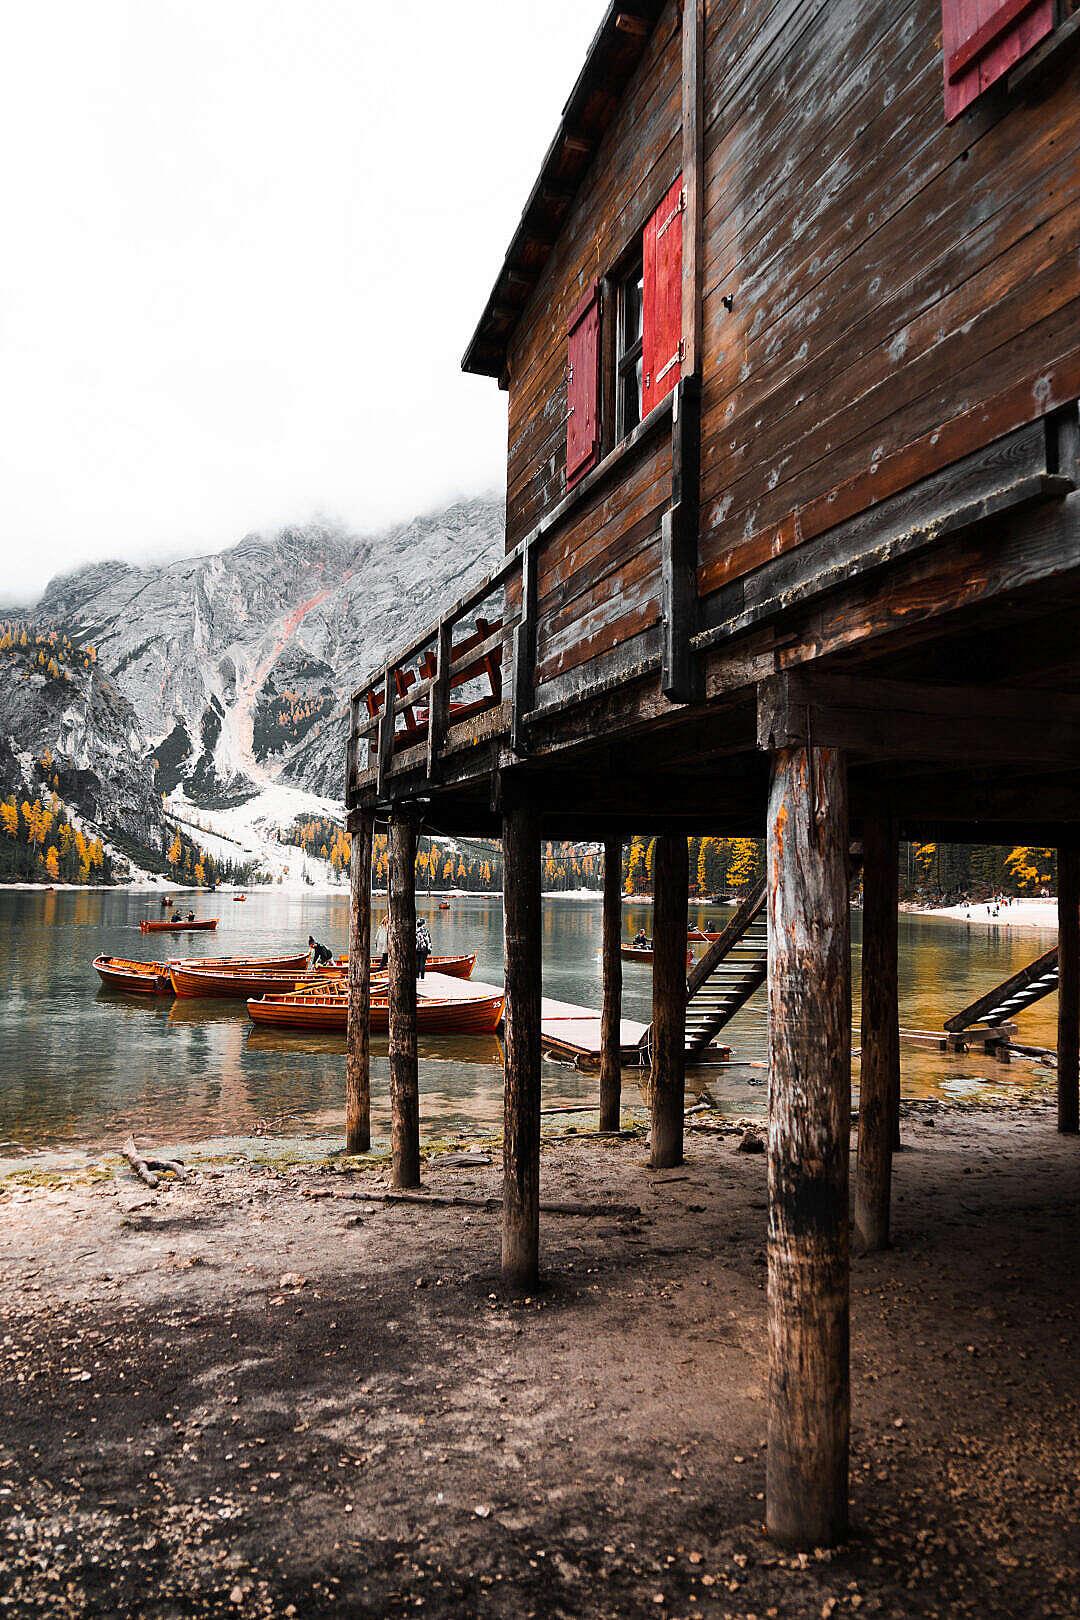 Download Pier Lago di Braies, Dolomites Italy FREE Stock Photo